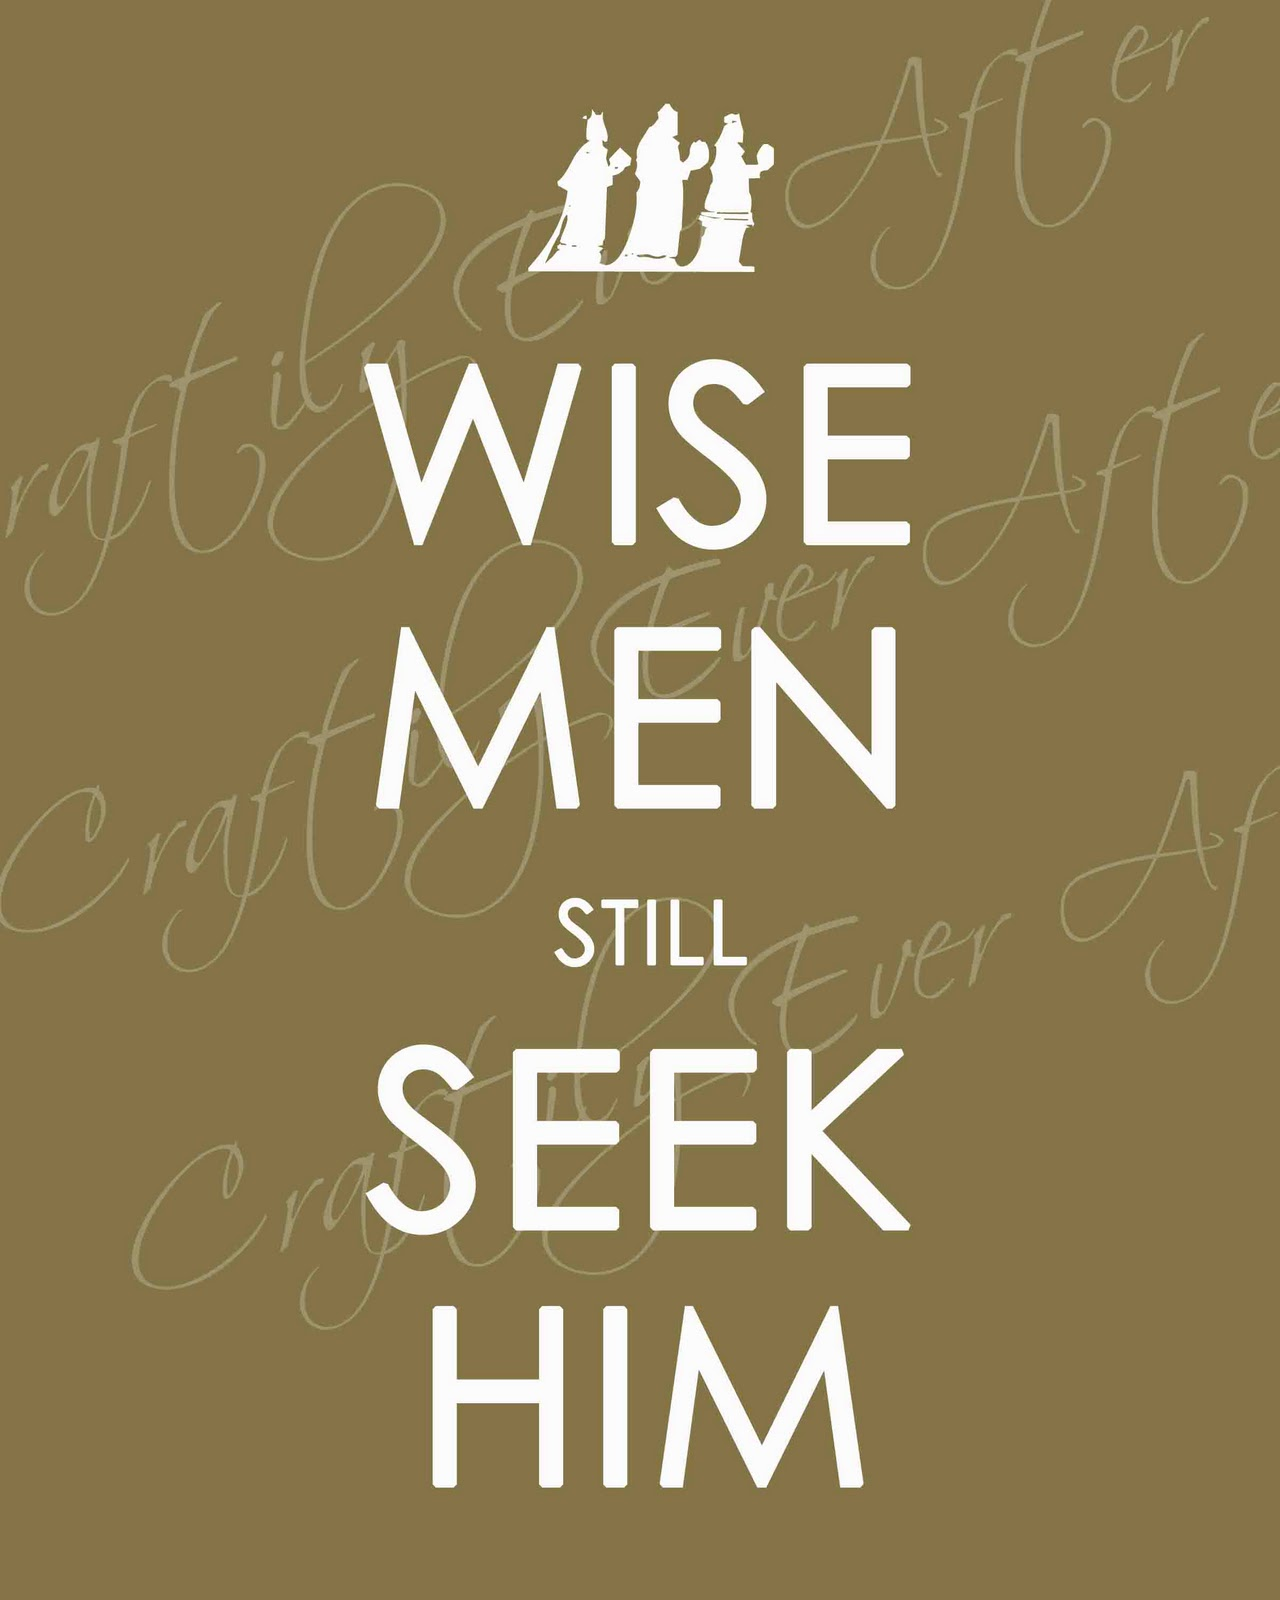 Christmas wise men quotes quotesgram